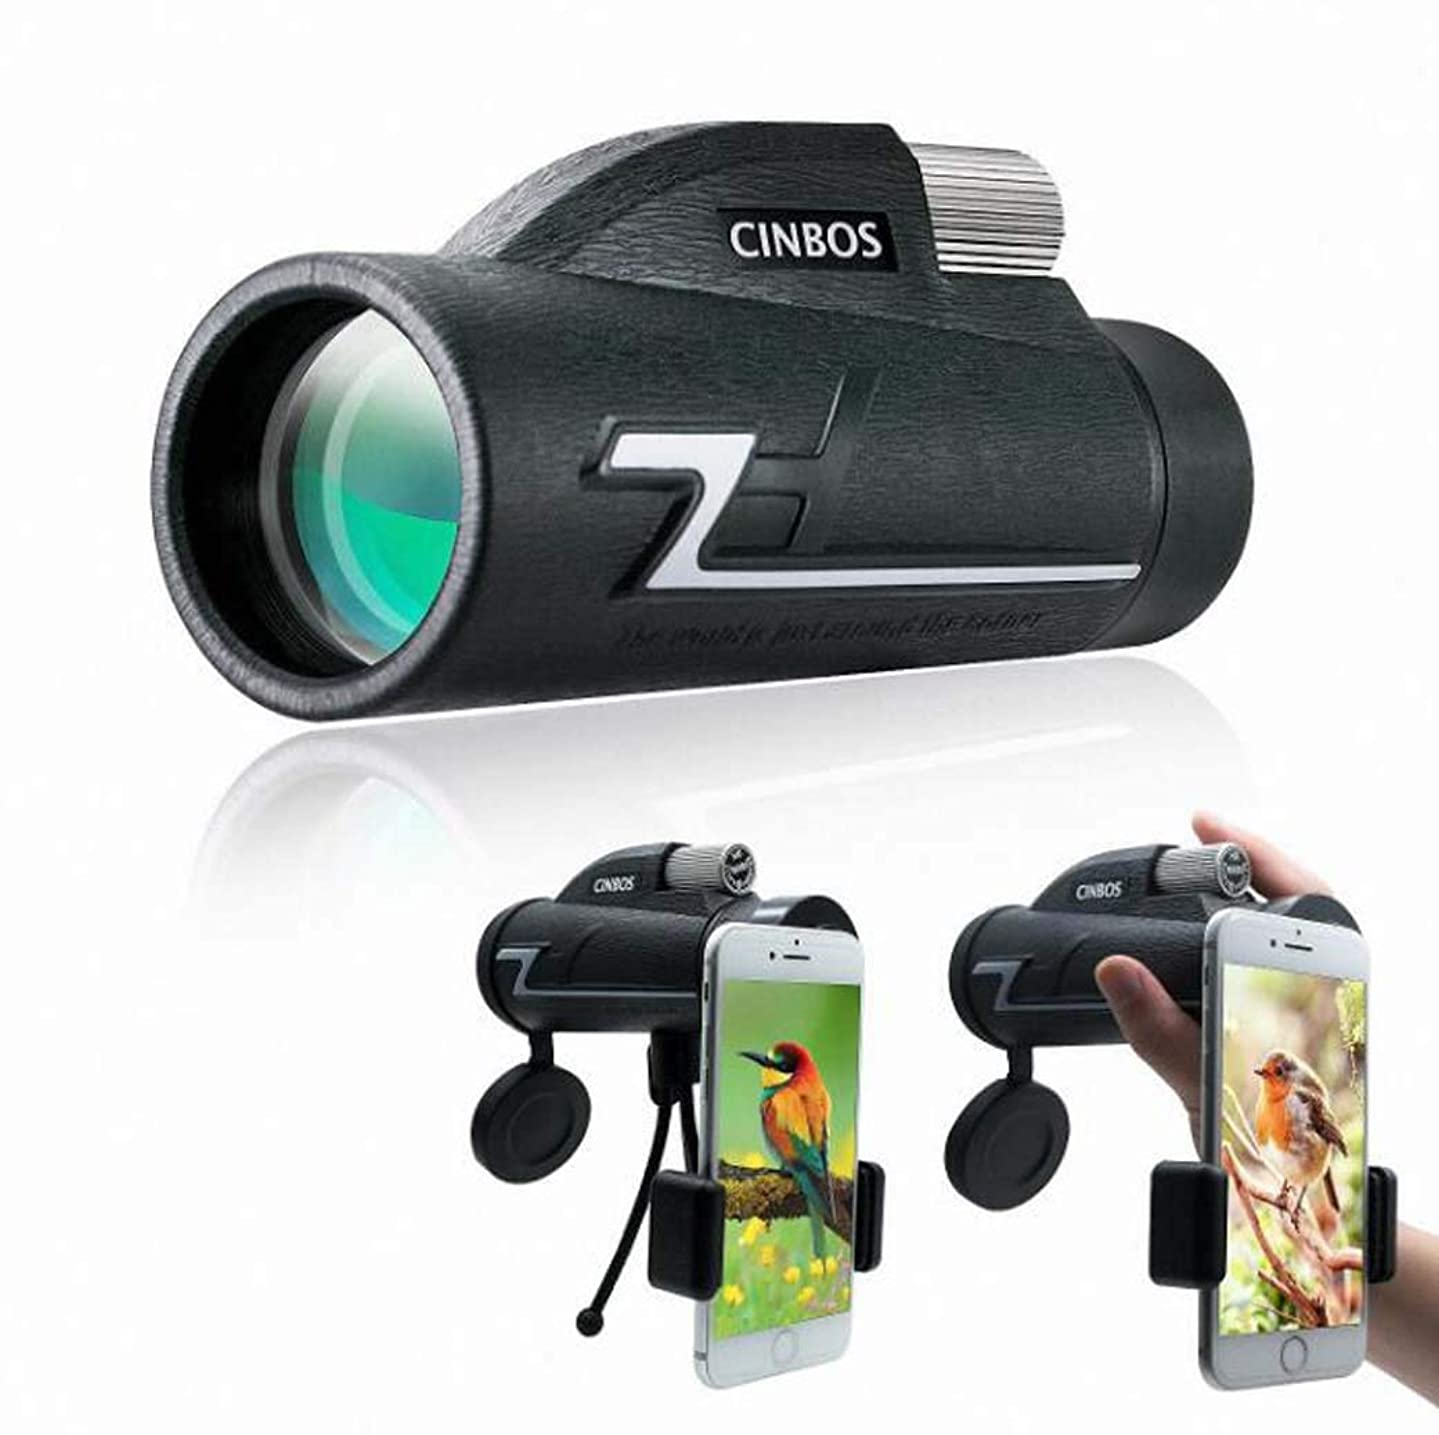 Super Zoom Monocular 16X50 Professional Powerful HD Vison,High Times Telescope Long Range for Hunting Stargazing